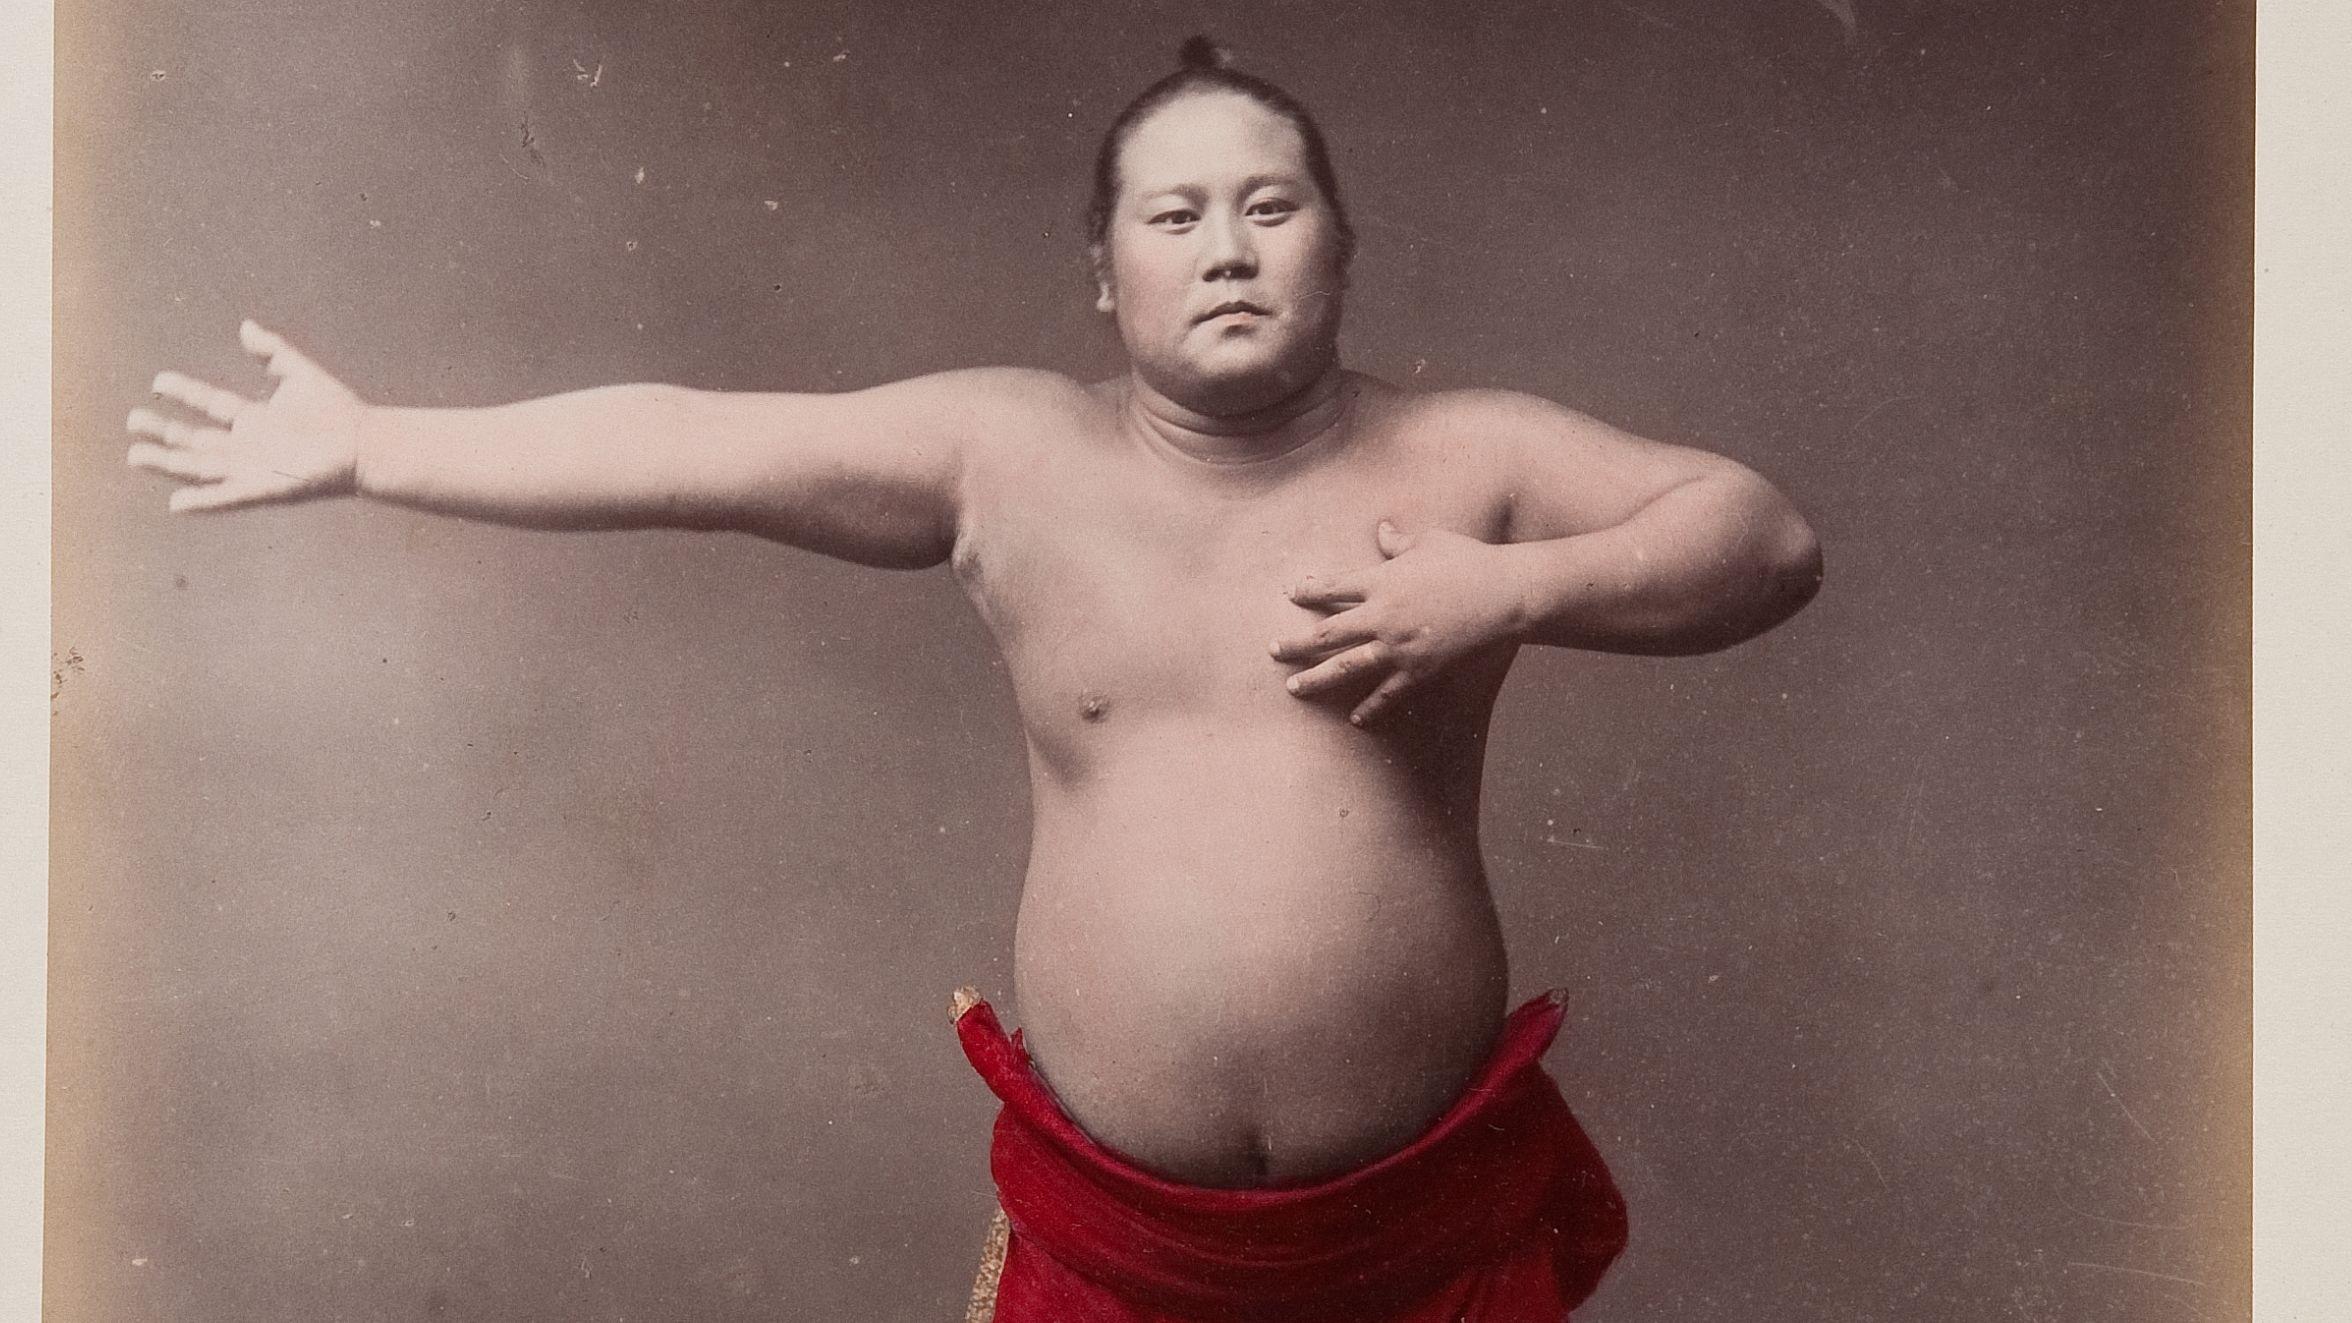 Sumô-Ringer, Fotograf unbekannt, ca.1880-1910, Tokio, Yokohama/Japan, Albumin-Abzug handkoloriert, Museum Fünf Kontinente, Inv.Nr. FO-22-1-41